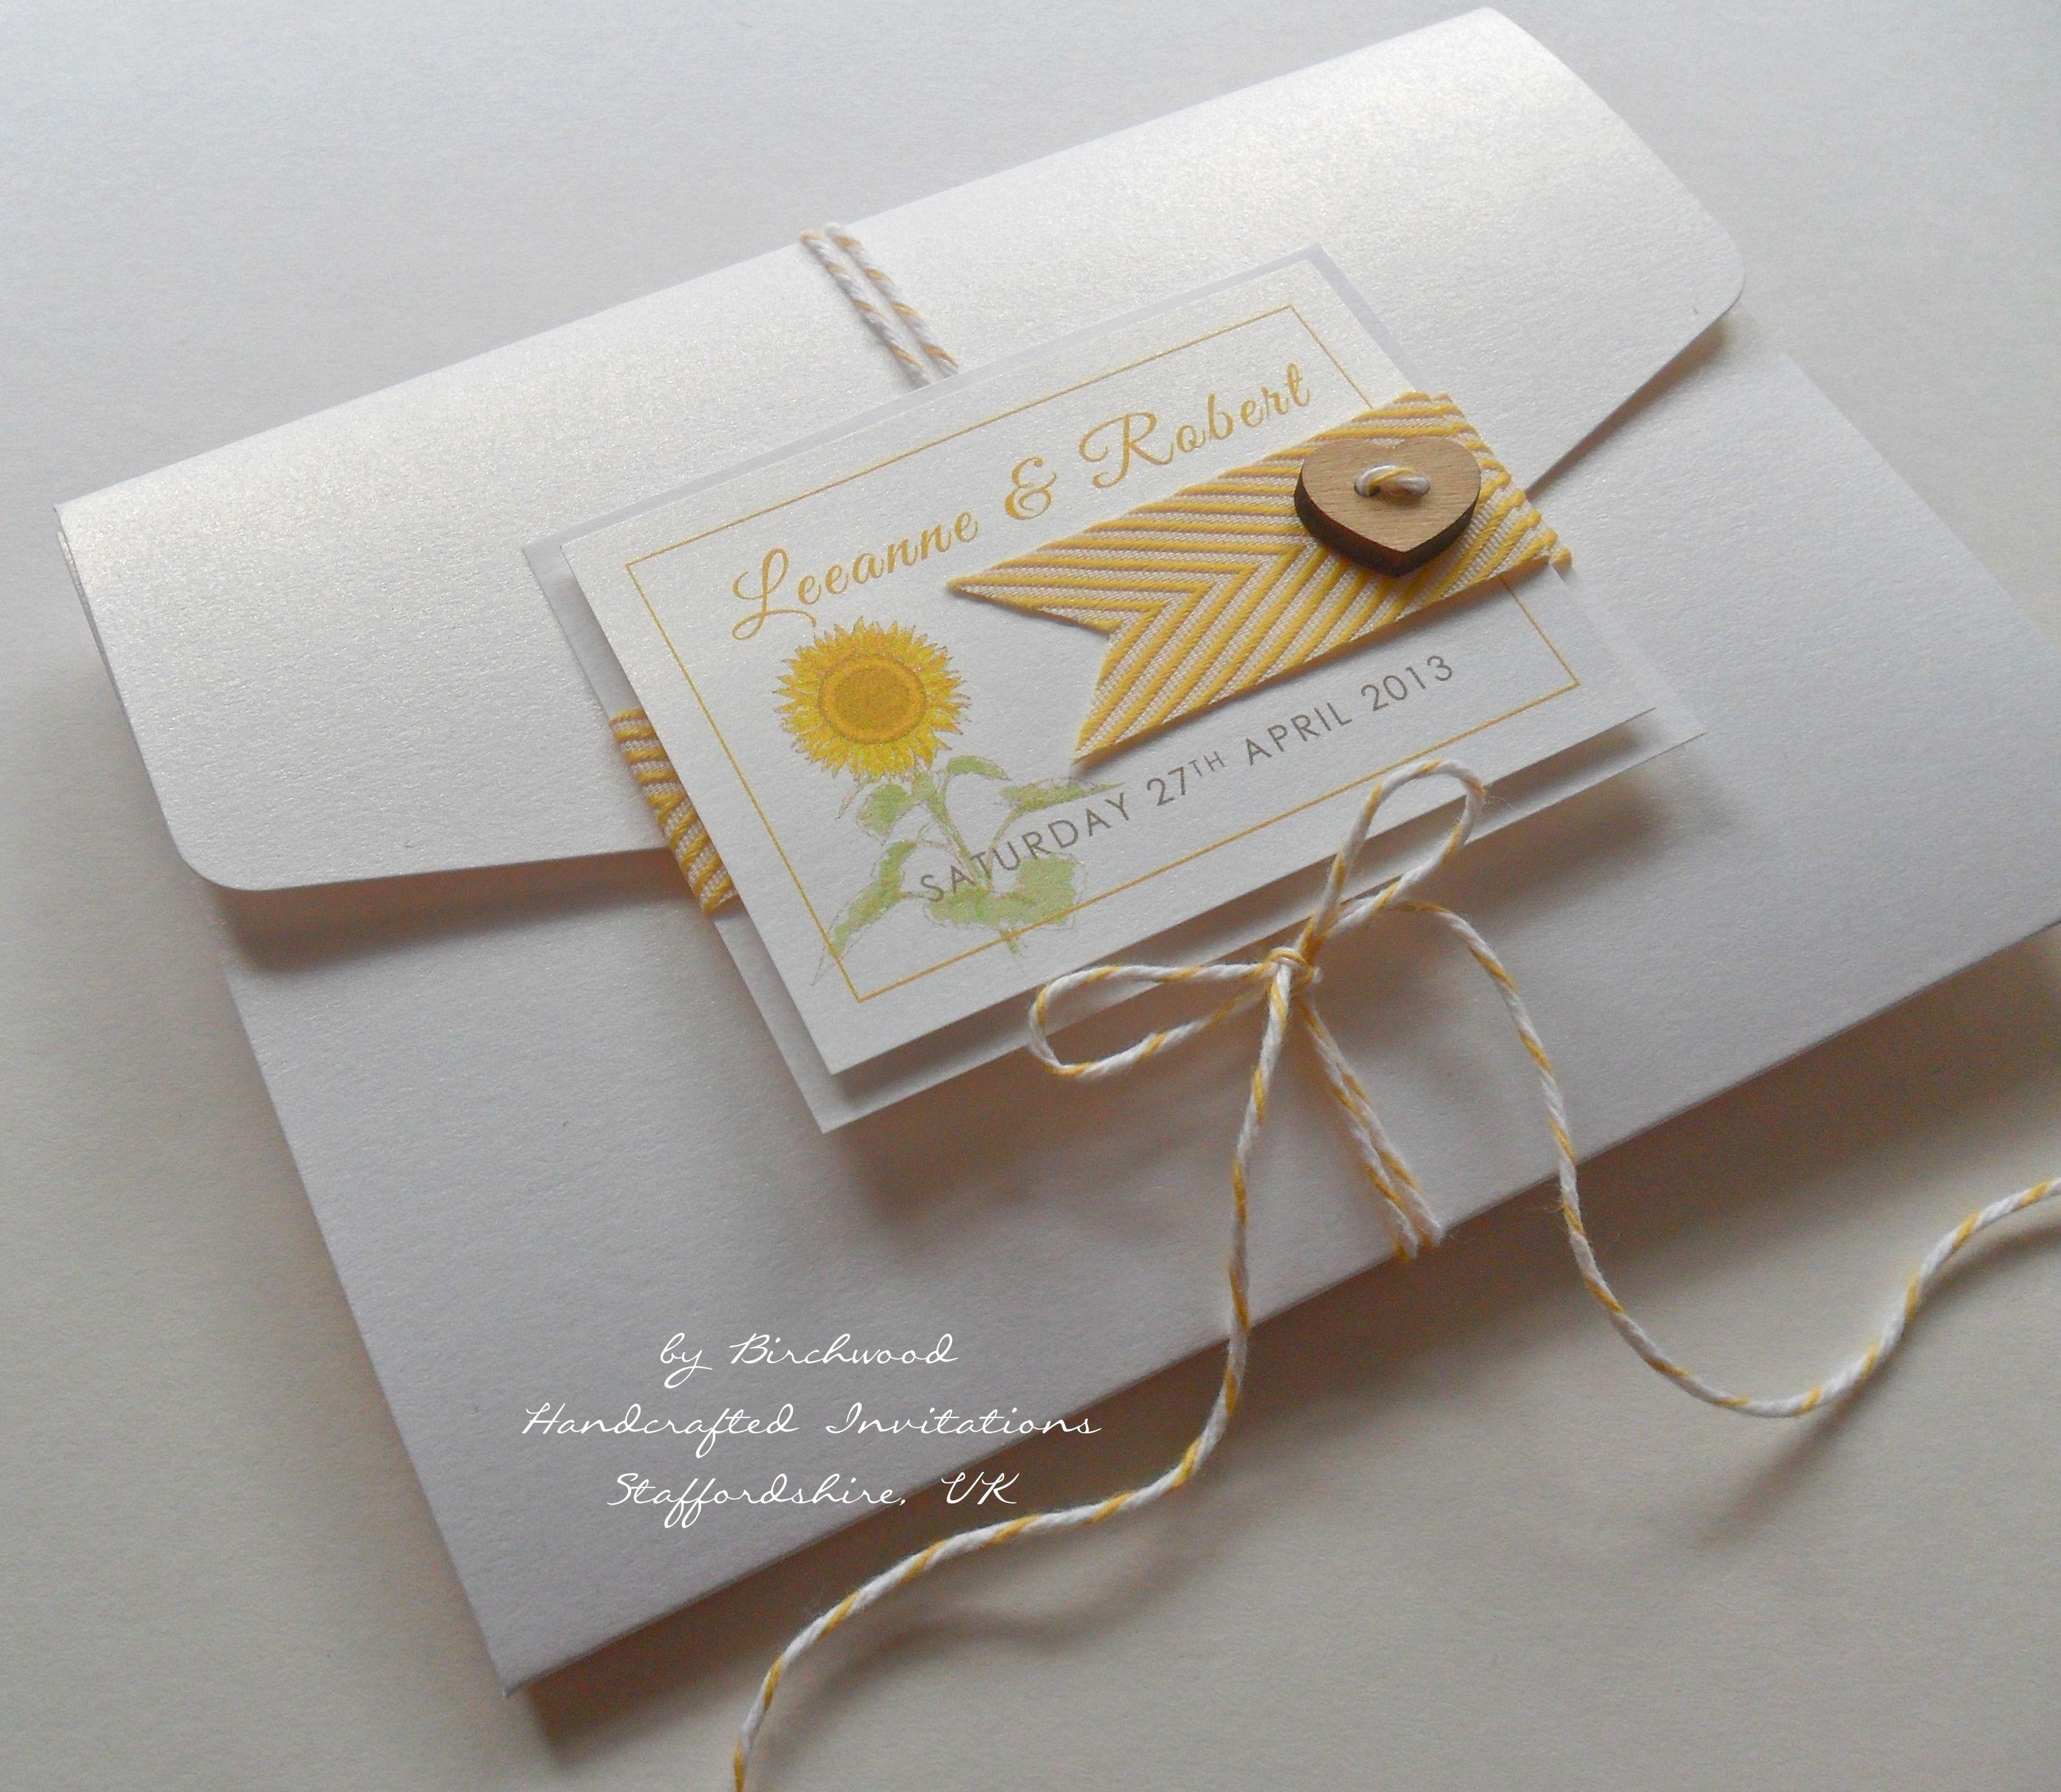 Sunflower pocket wallet wedding invitation with wooden